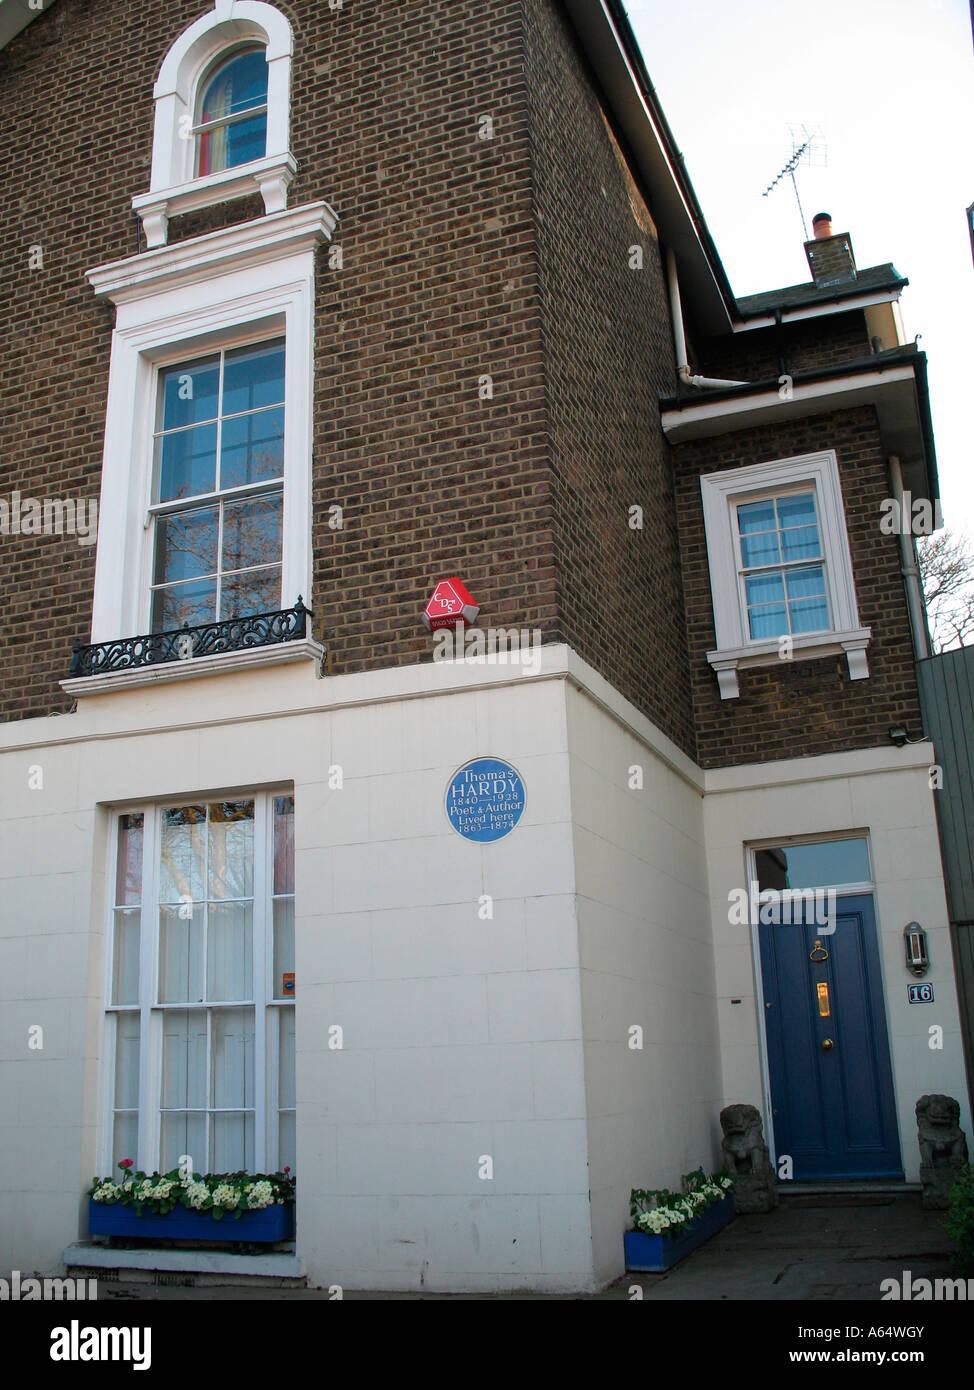 Thomas Hardy lived here London England - Stock Image